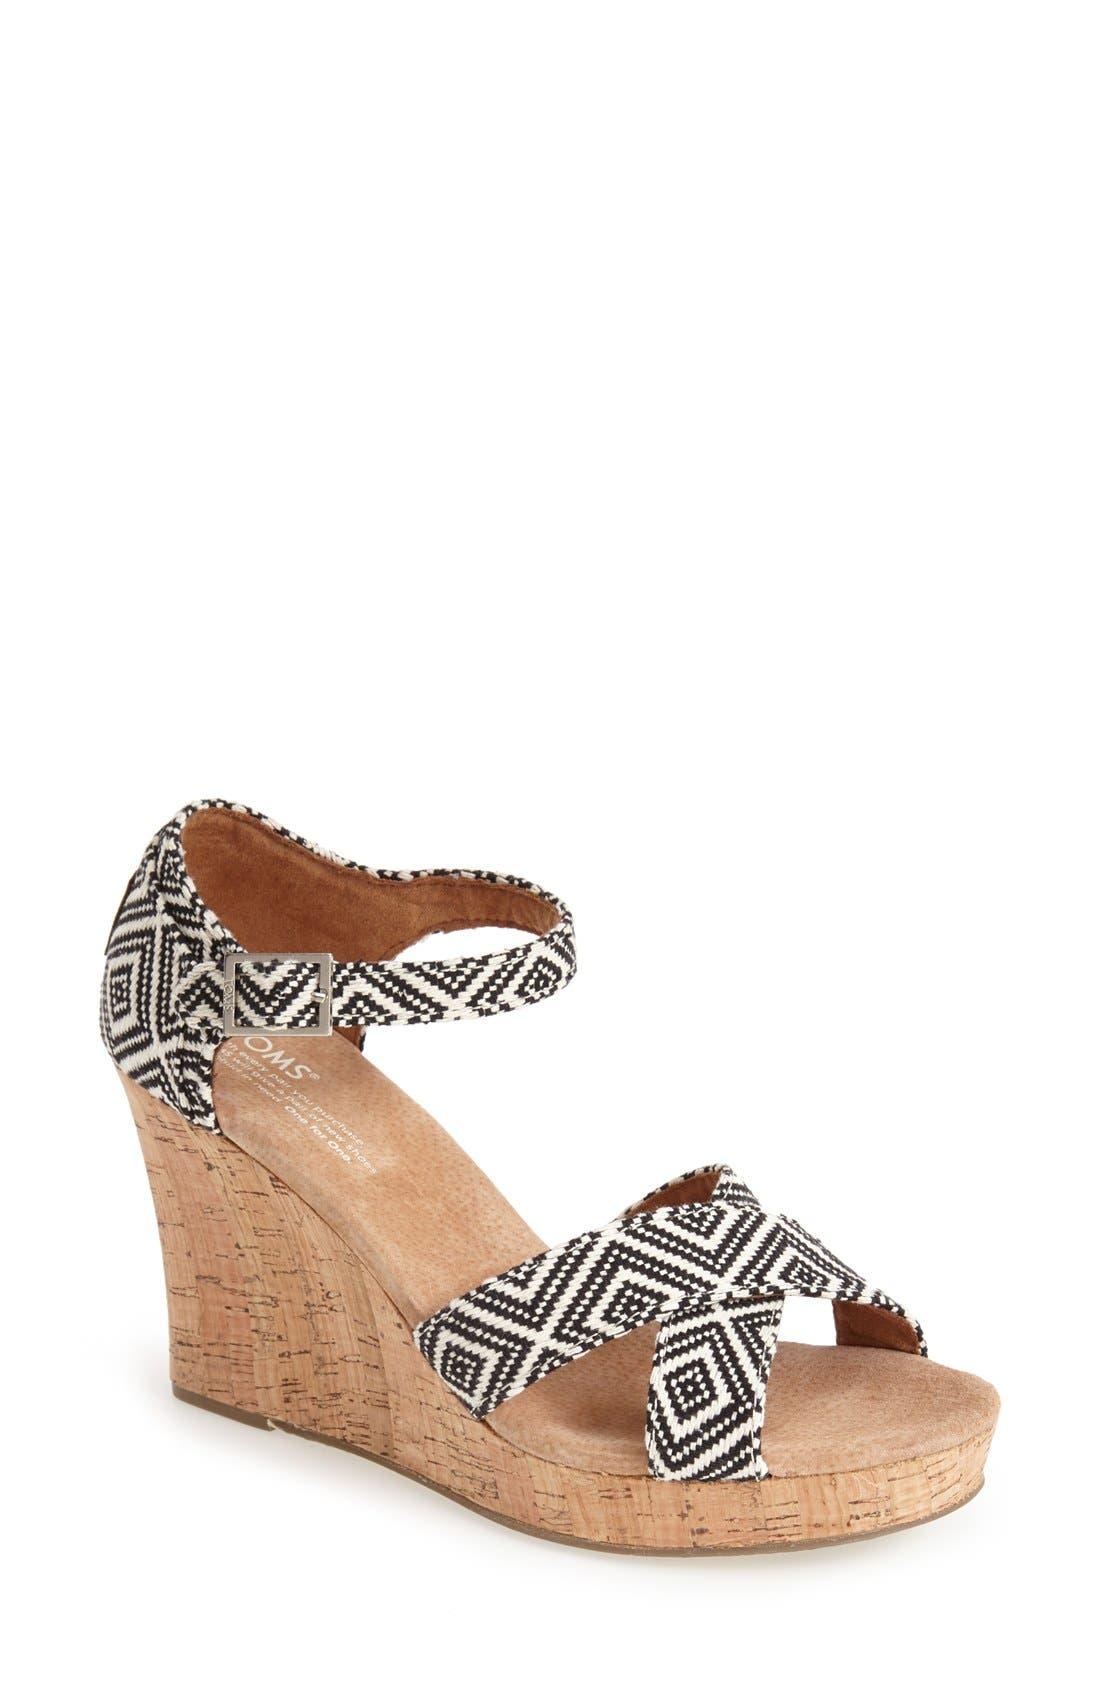 Main Image - TOMS Canvas Woven Geometric Print Wedge Sandal (Women)